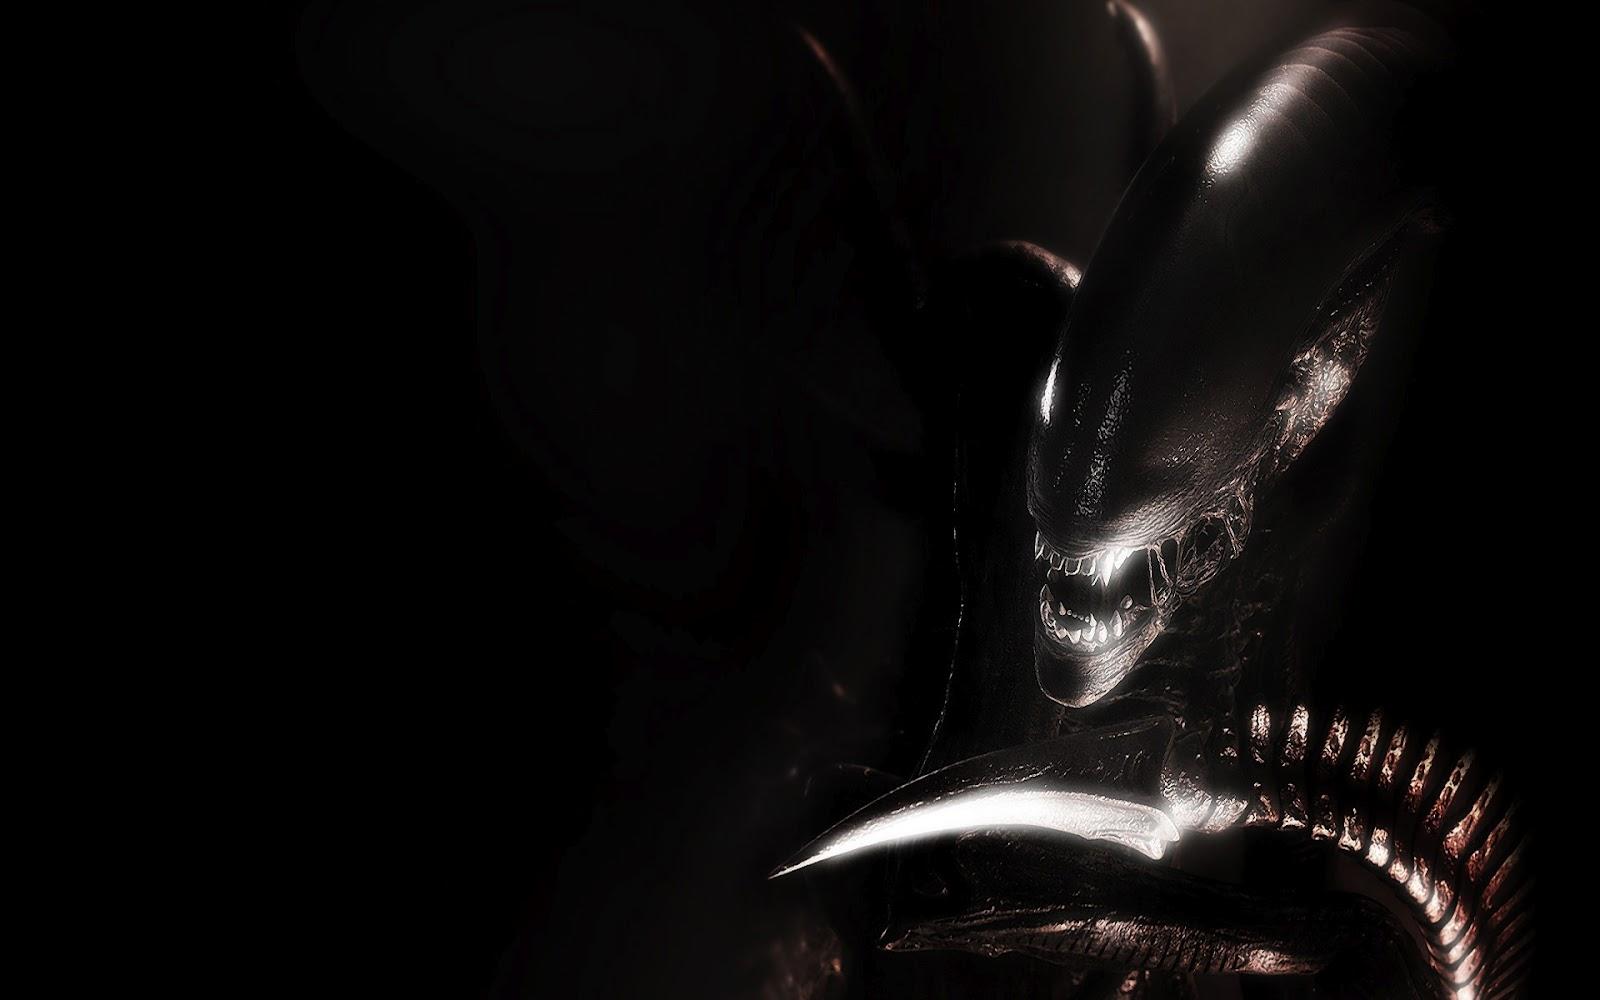 http://3.bp.blogspot.com/-CYqULus0VEA/UBHhkHZCPWI/AAAAAAAACUw/tlmES2WGxMI/s1600/Alien+Series+Movie+wallpapers.jpg